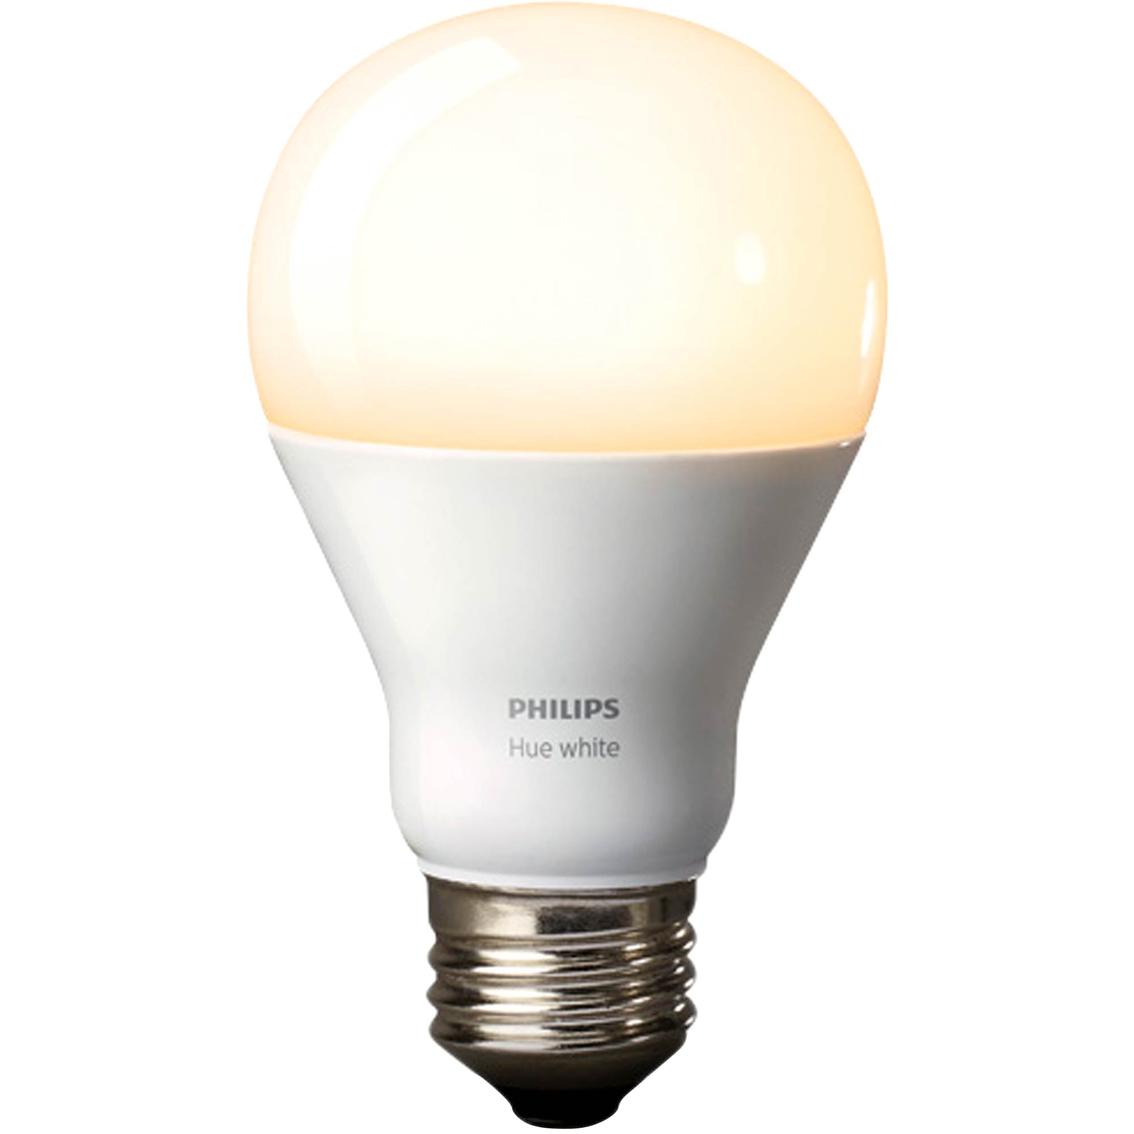 Philips Hue White Single Bulb